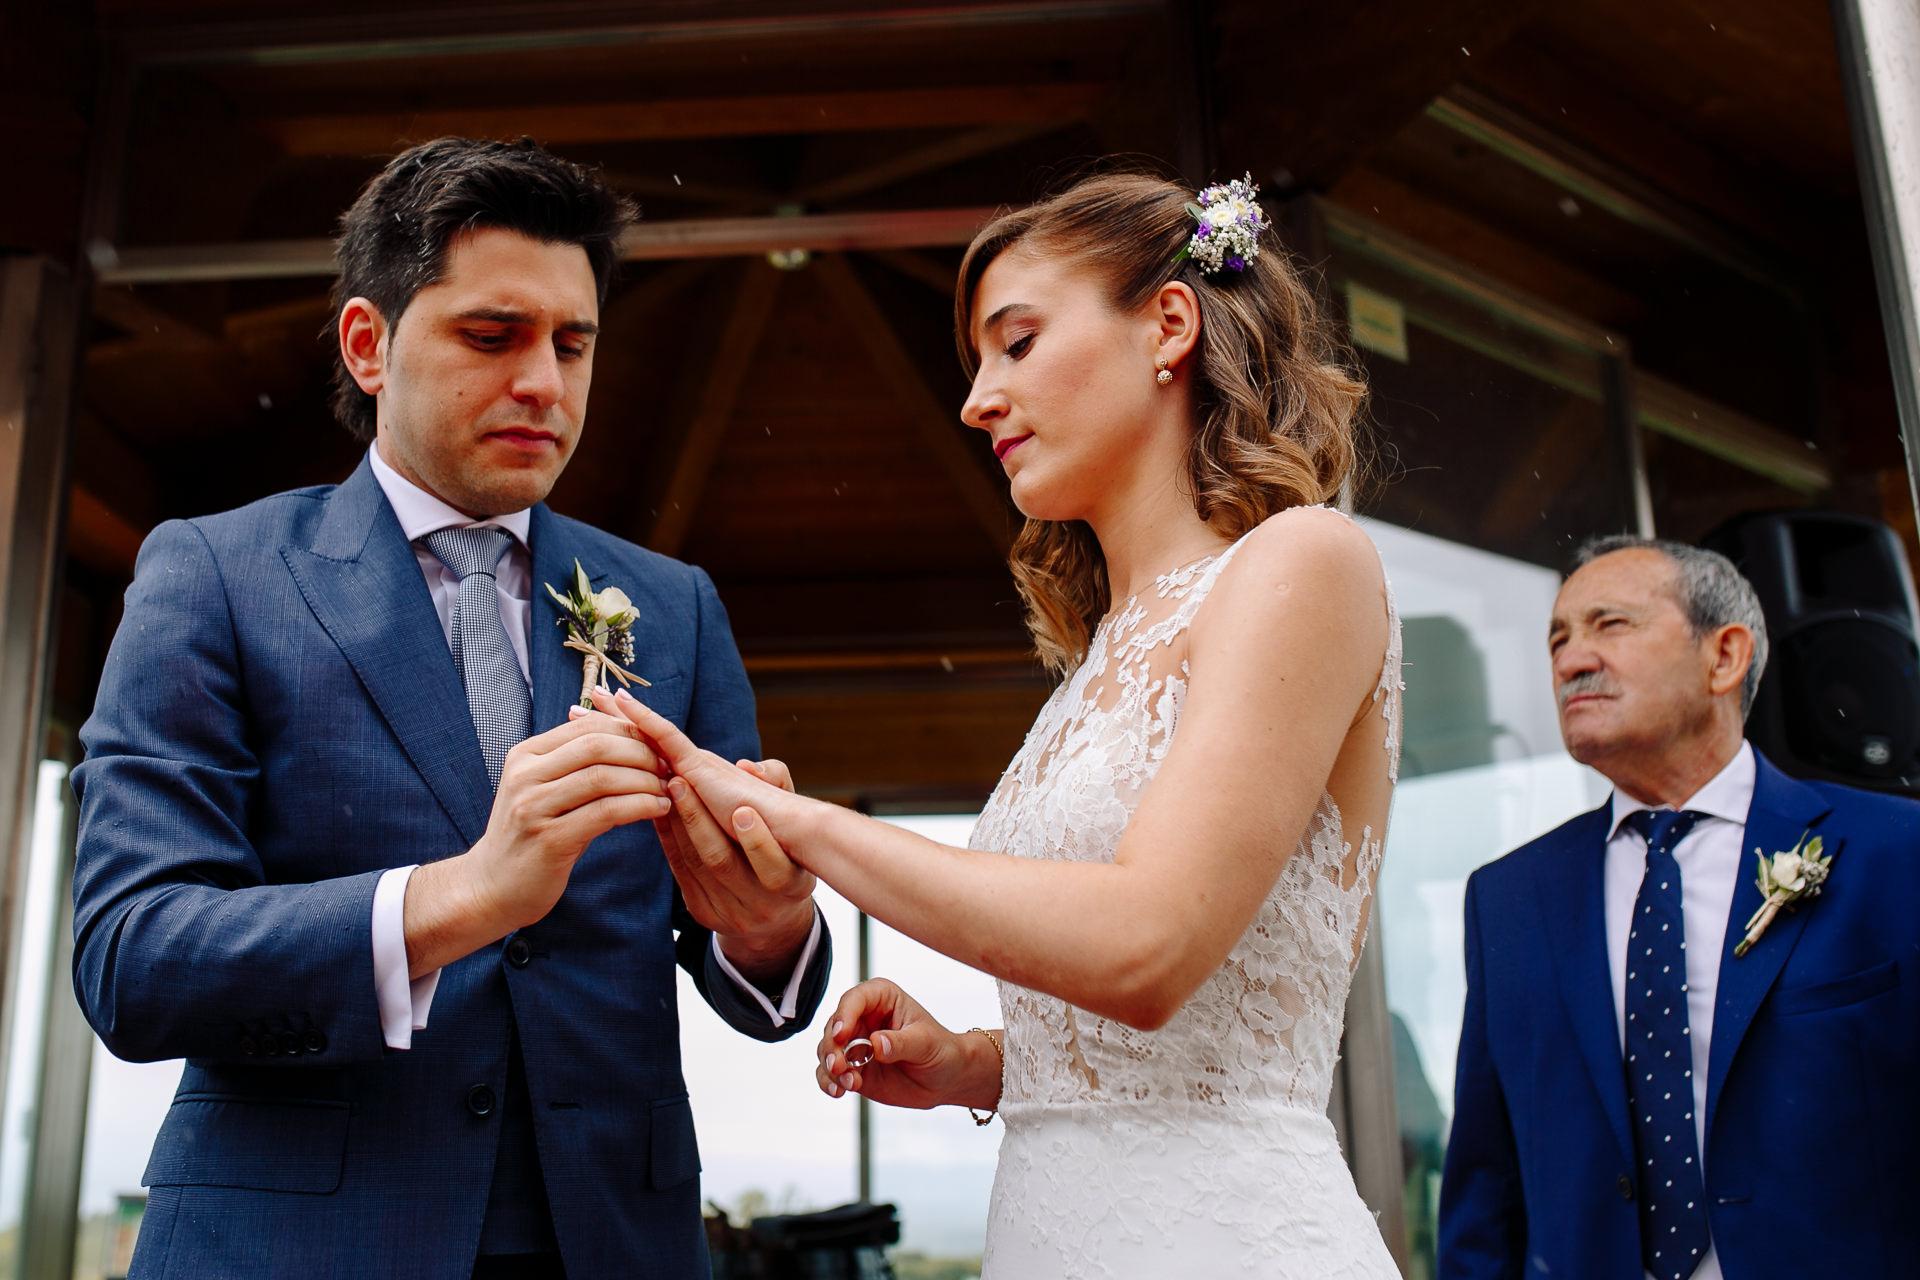 boda civil eguren ugarte la rioja 133050